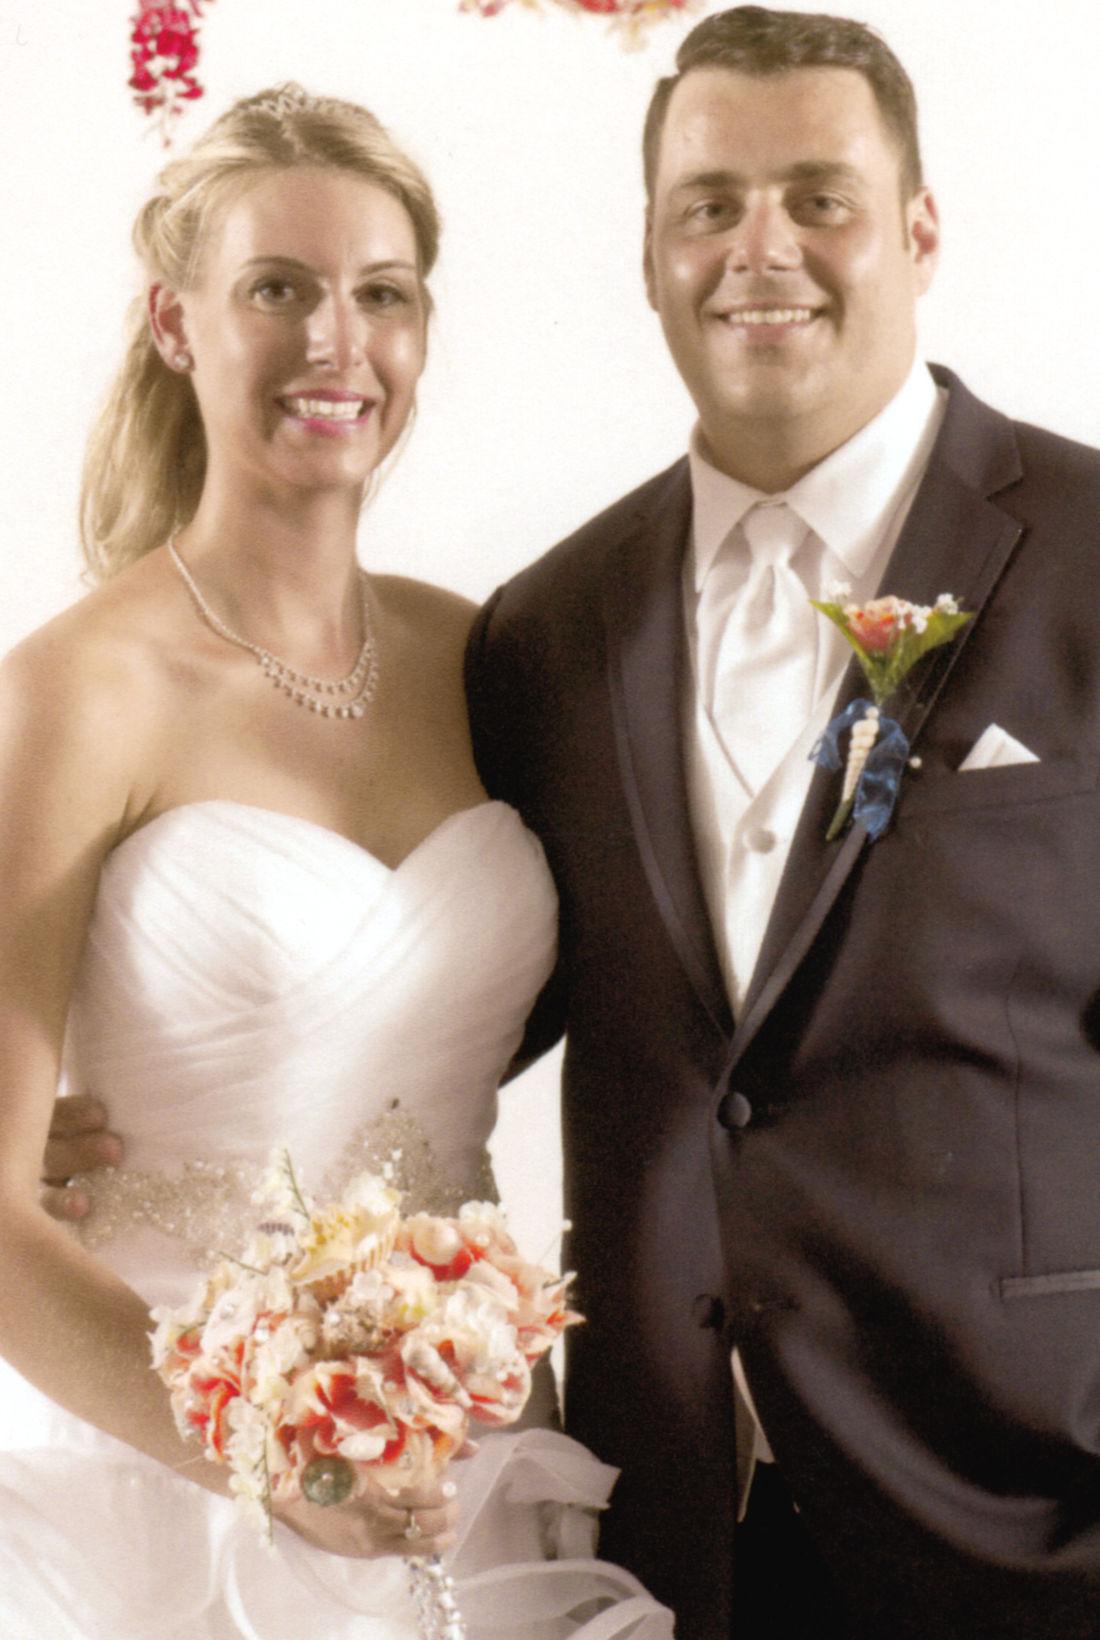 Mr. and Mrs. Jacob Ashby